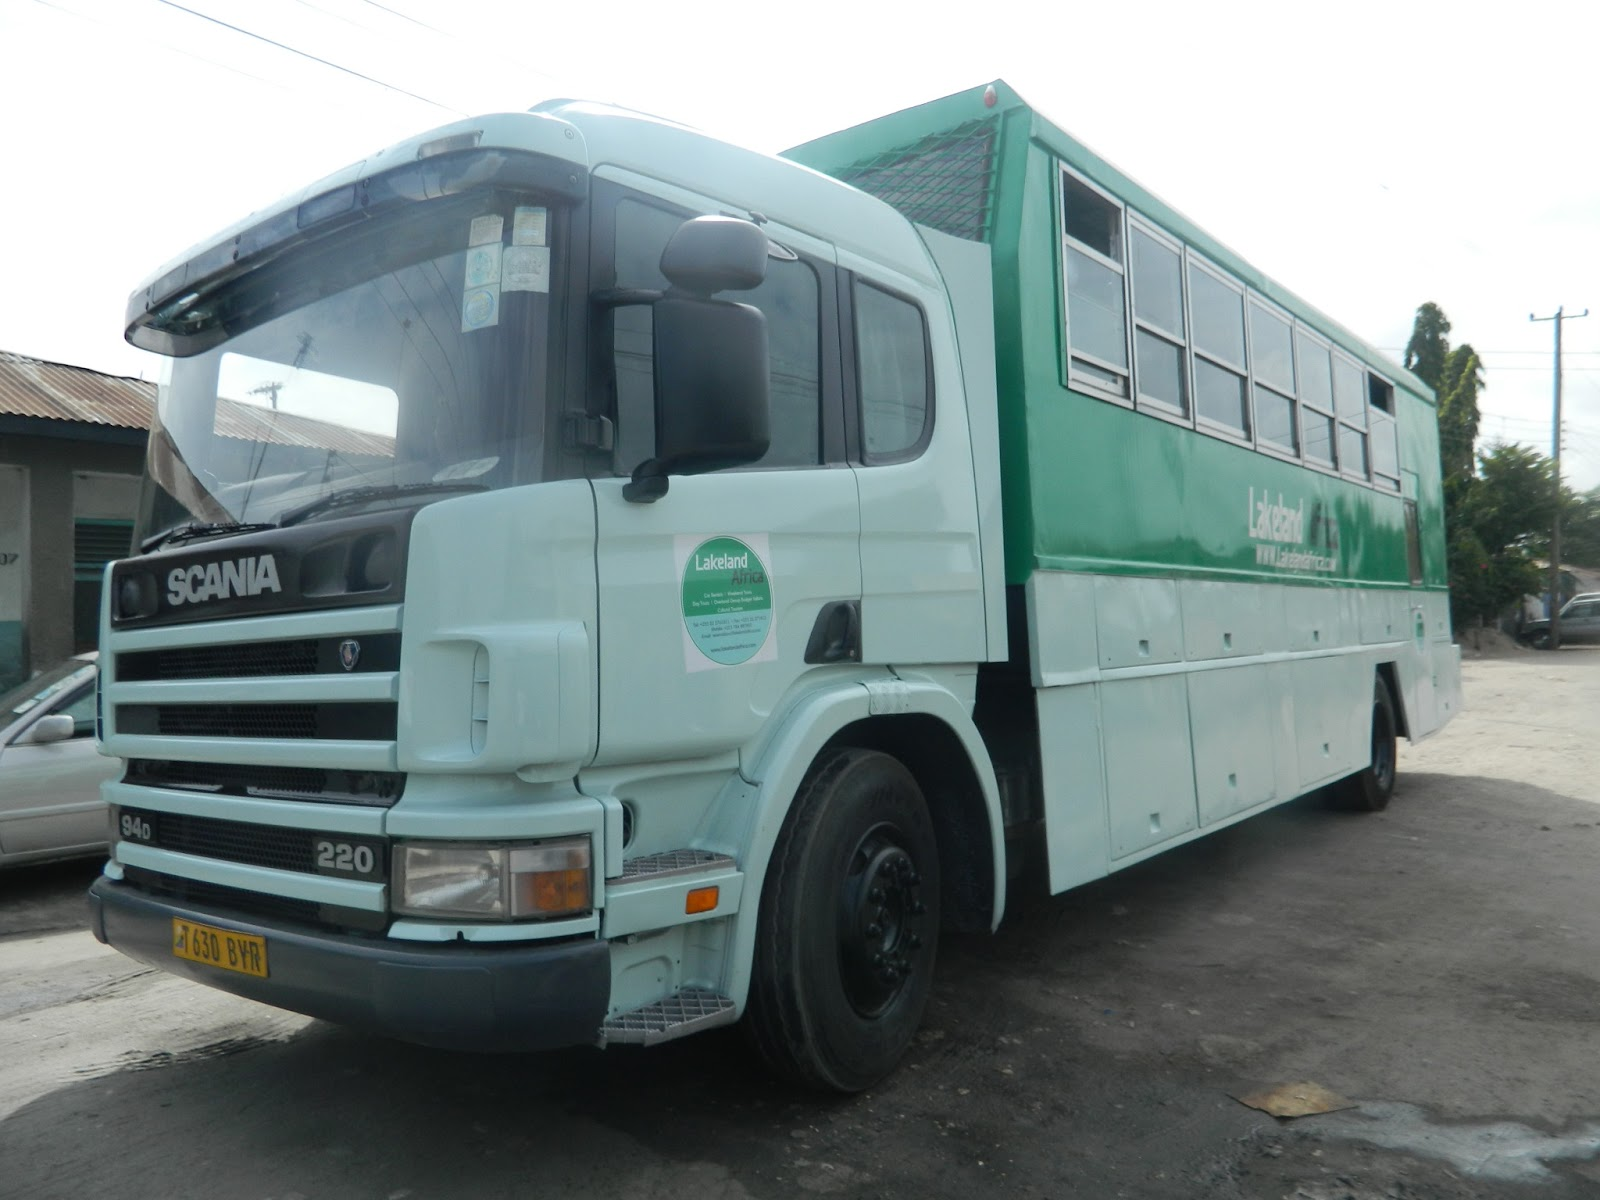 Lakeland Africa, Overland Truck